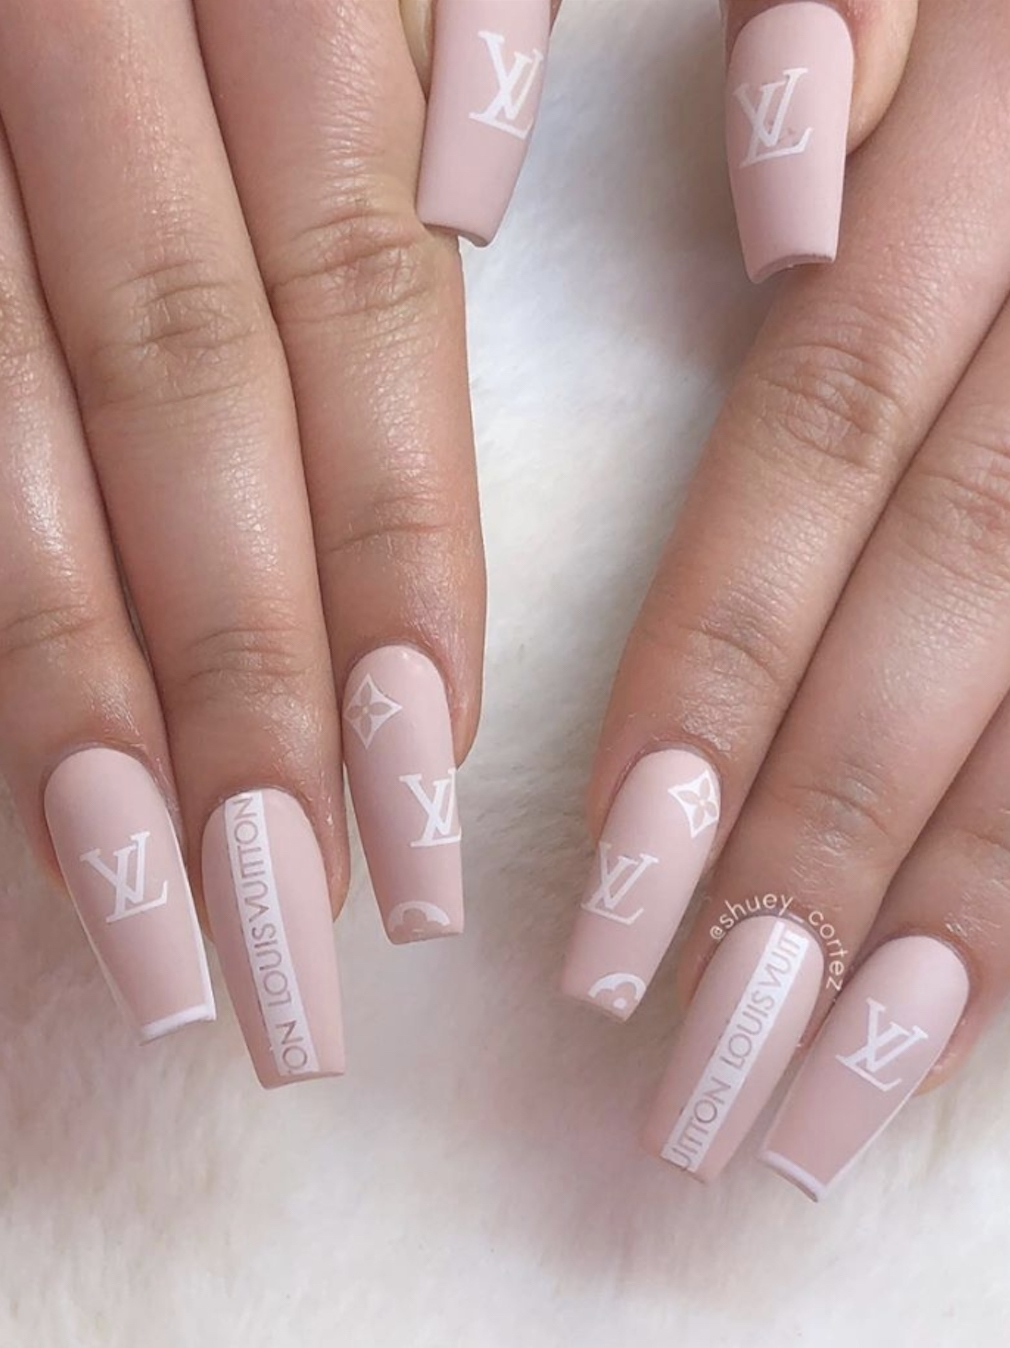 Neutral Louis Vuitton nails acrylic - designer nails acrylic